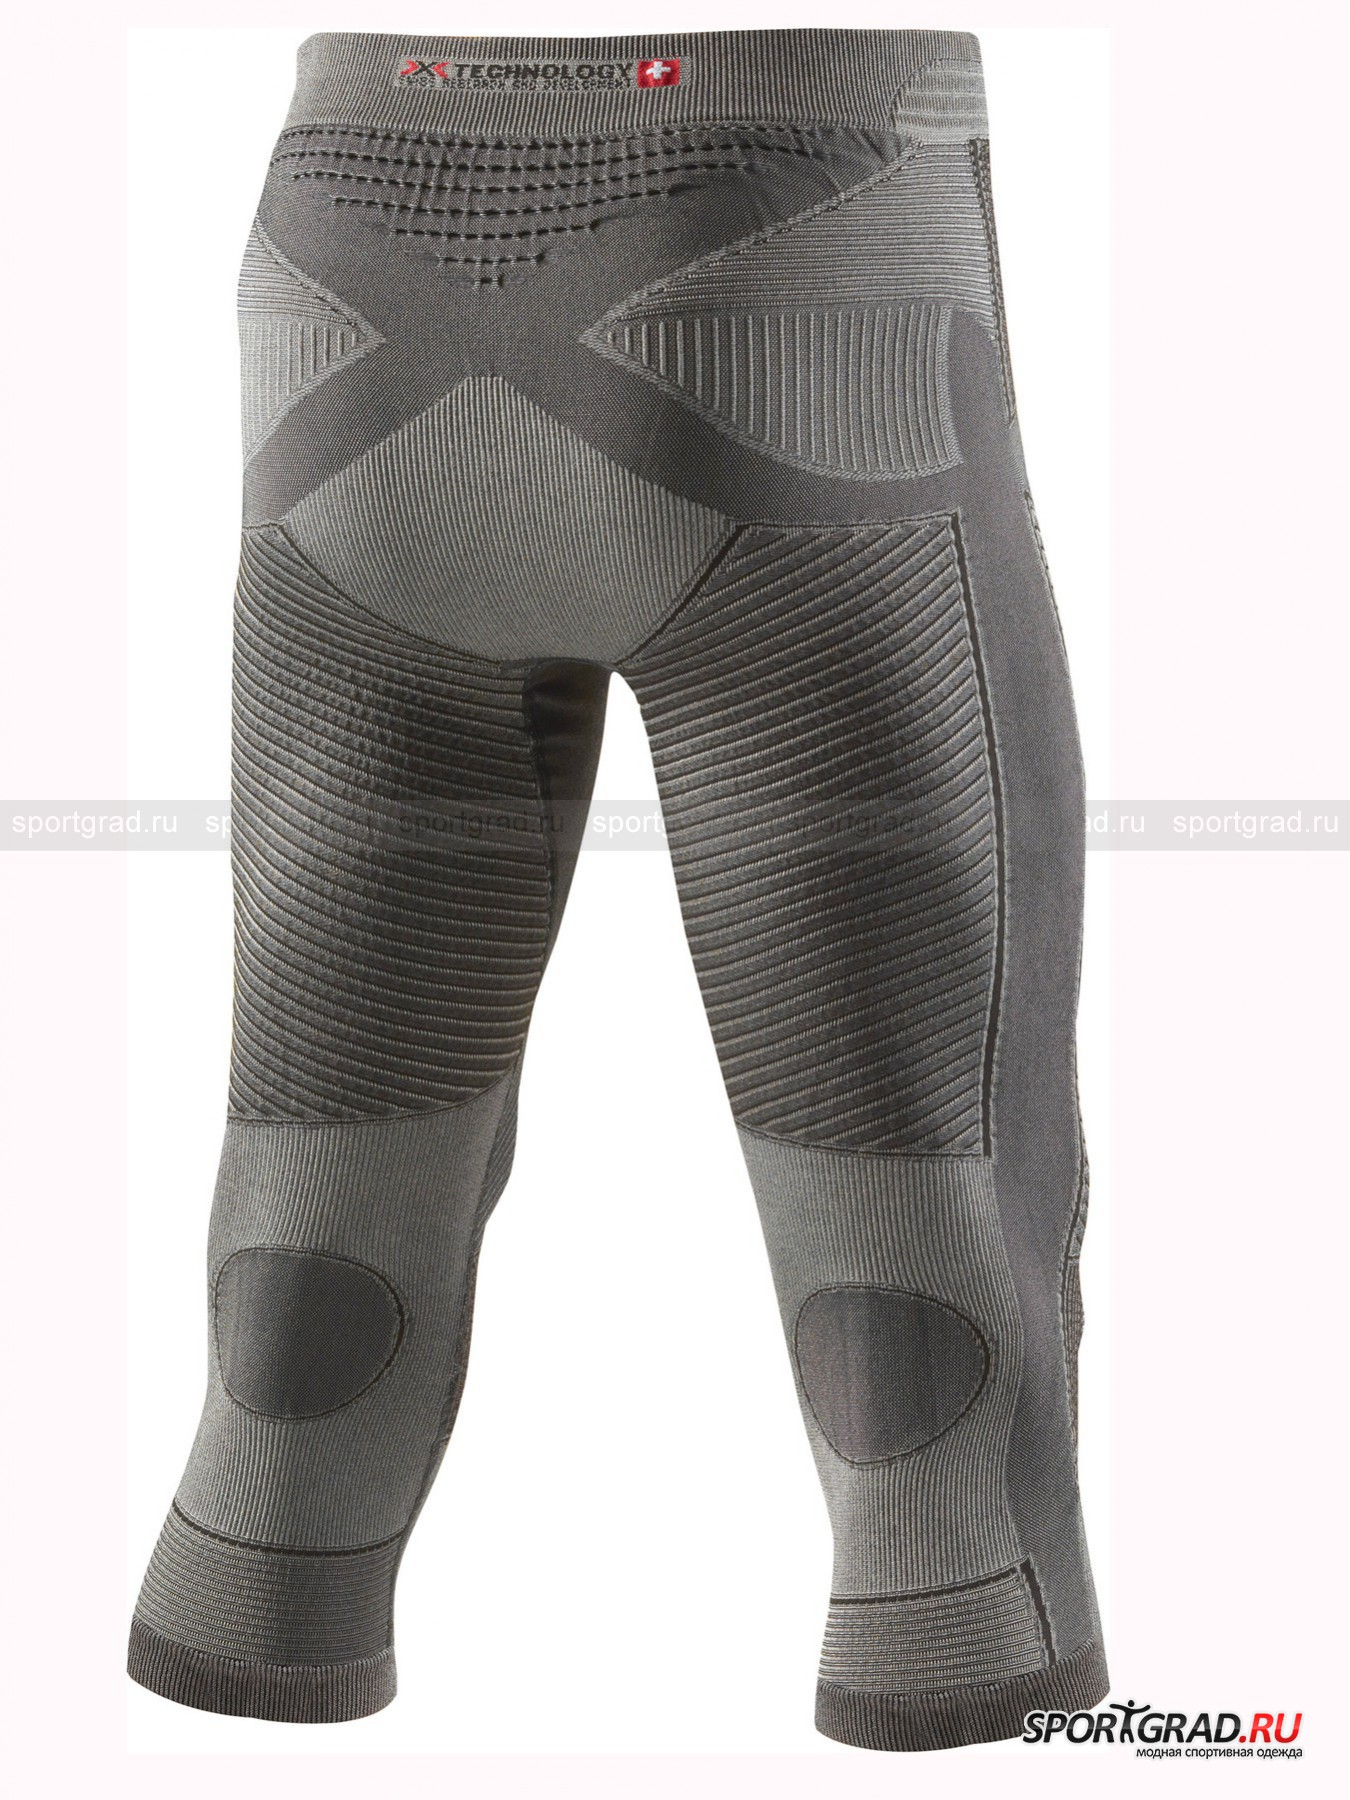 Белье: термобриджи мужские Pants Med RADIACTOR X-BIONIC для занятий спортом от Спортград